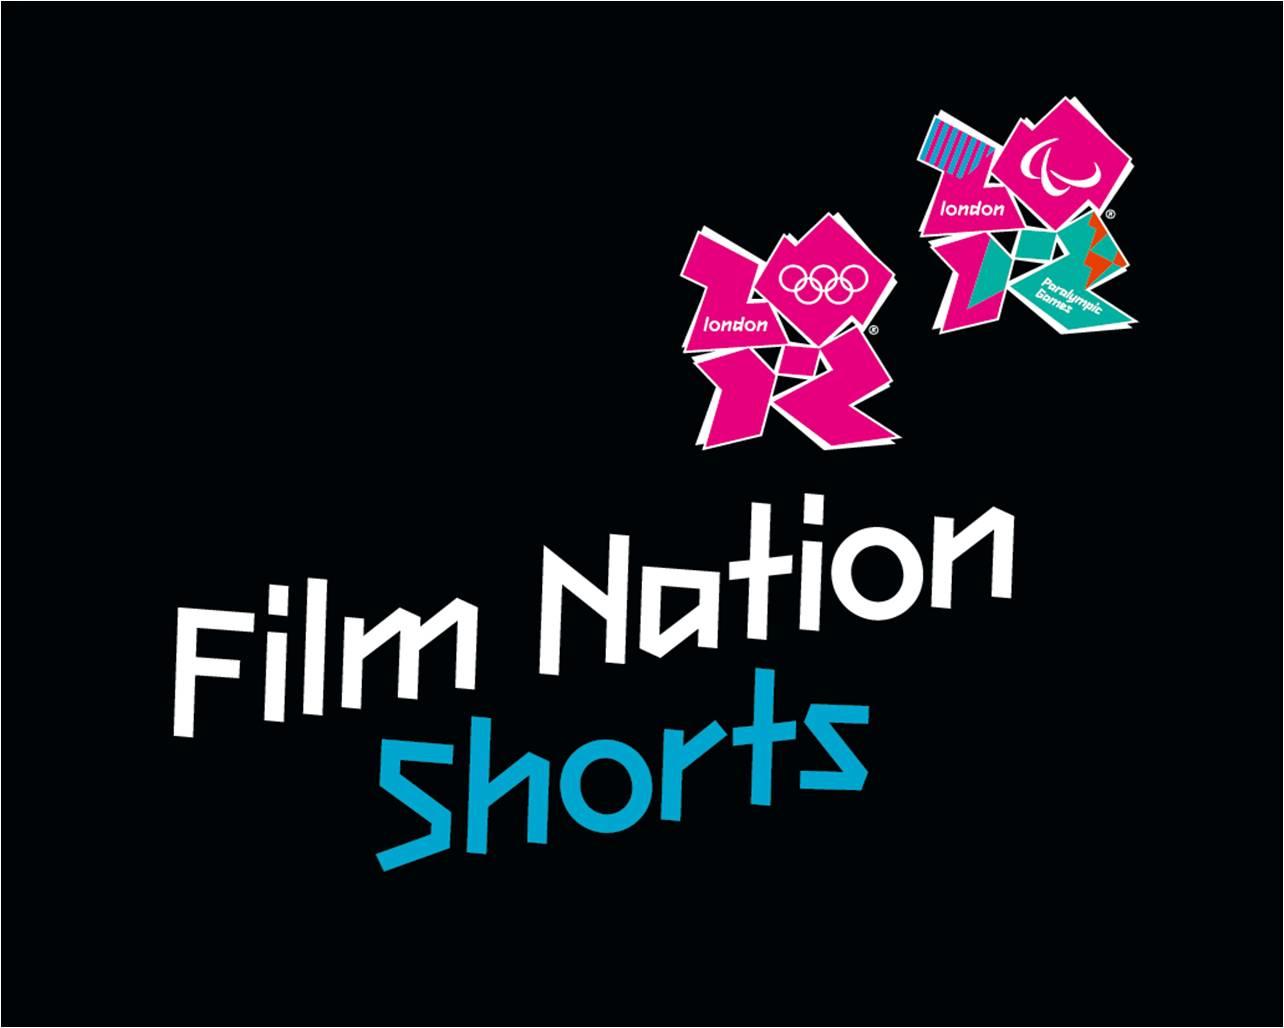 Olympic Film Nation Shorts